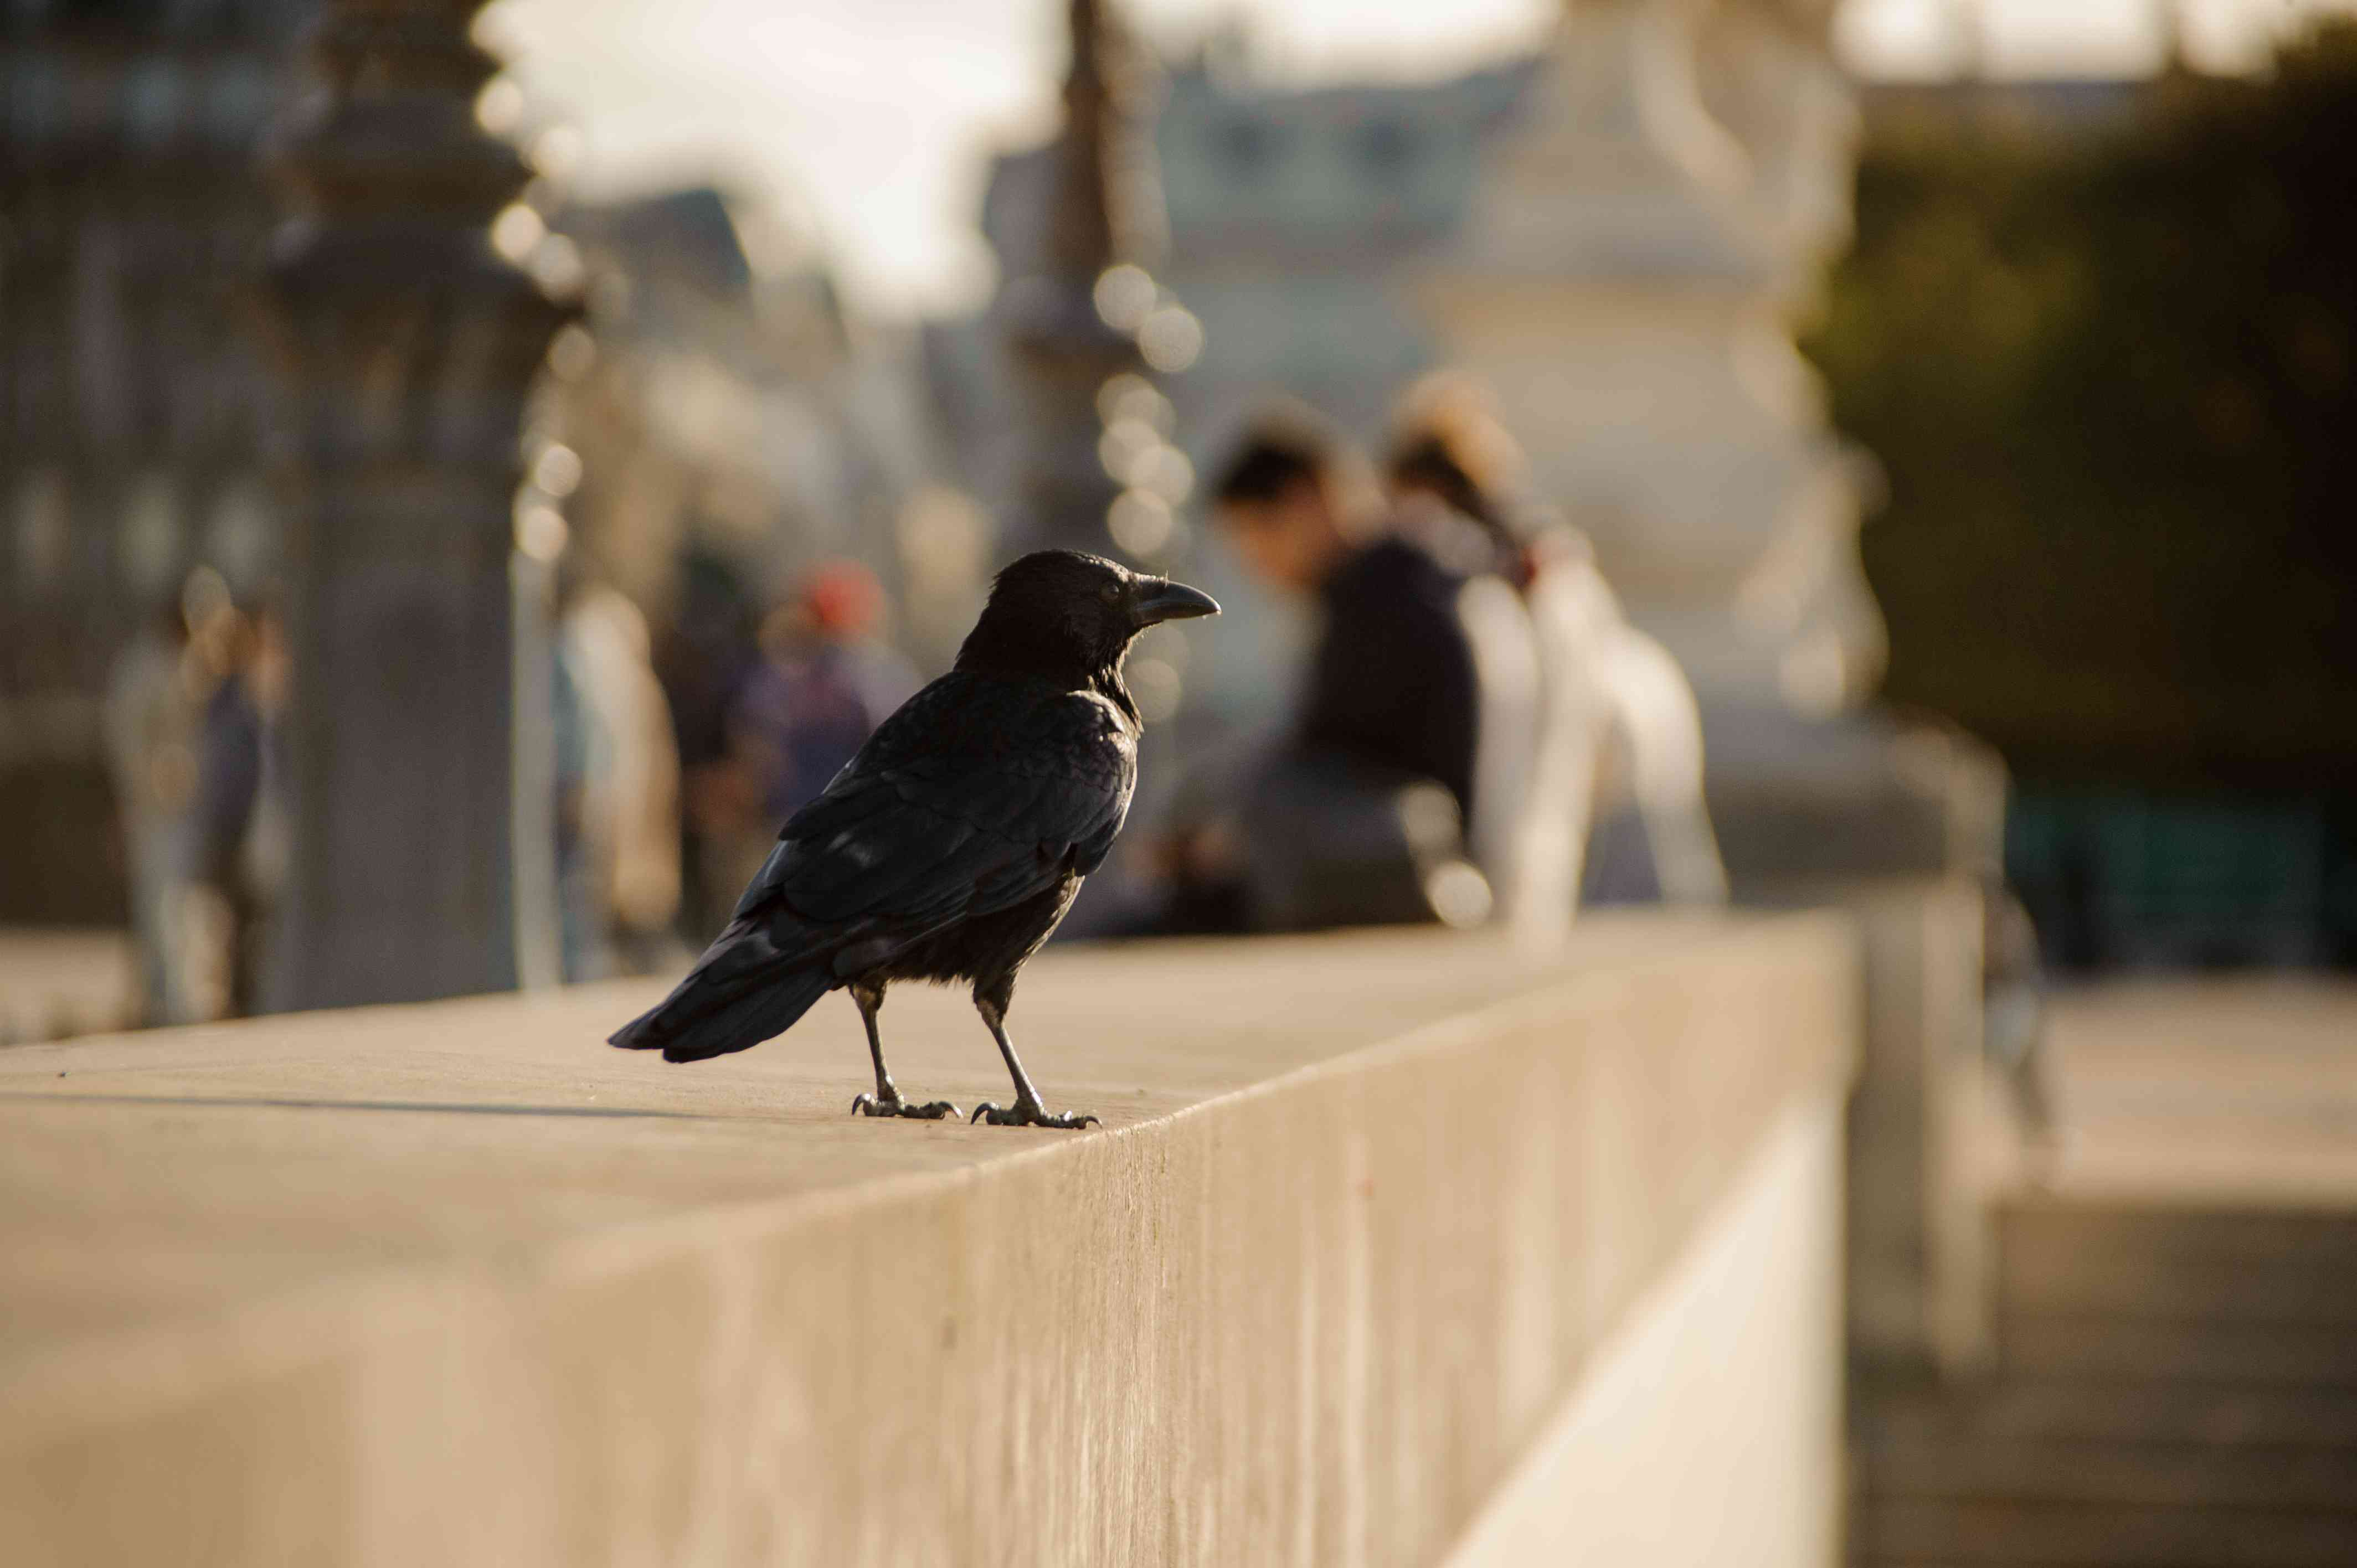 crow watching people